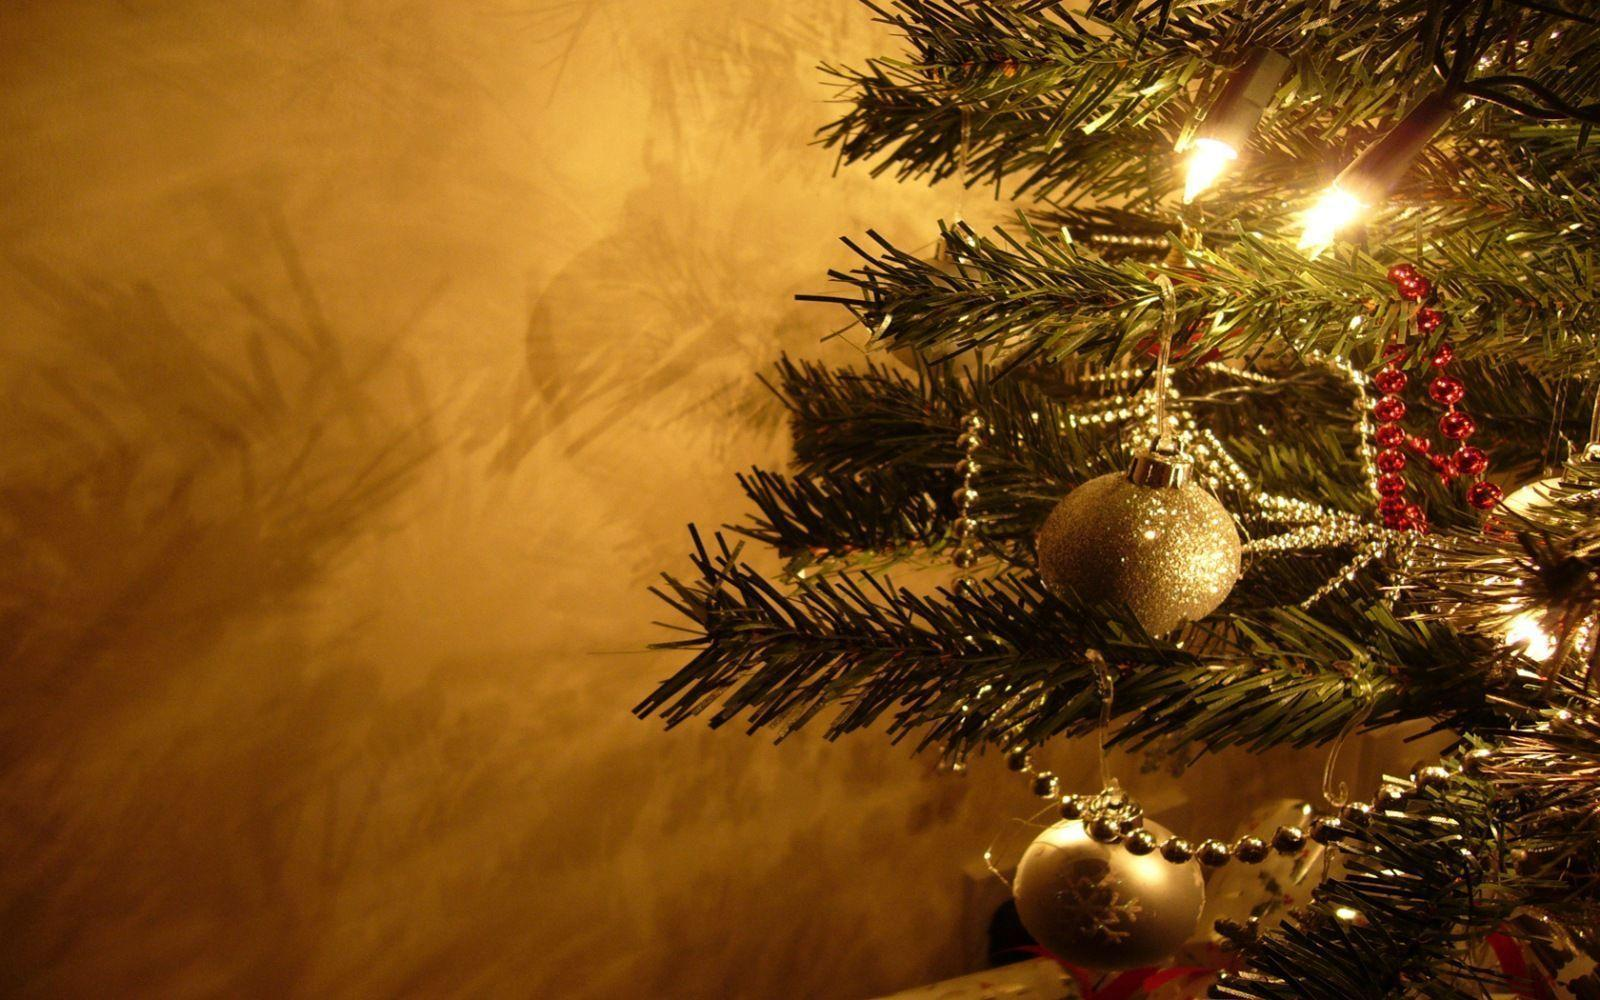 Free Christmas Desktop Backgrounds - Wallpaper Cave